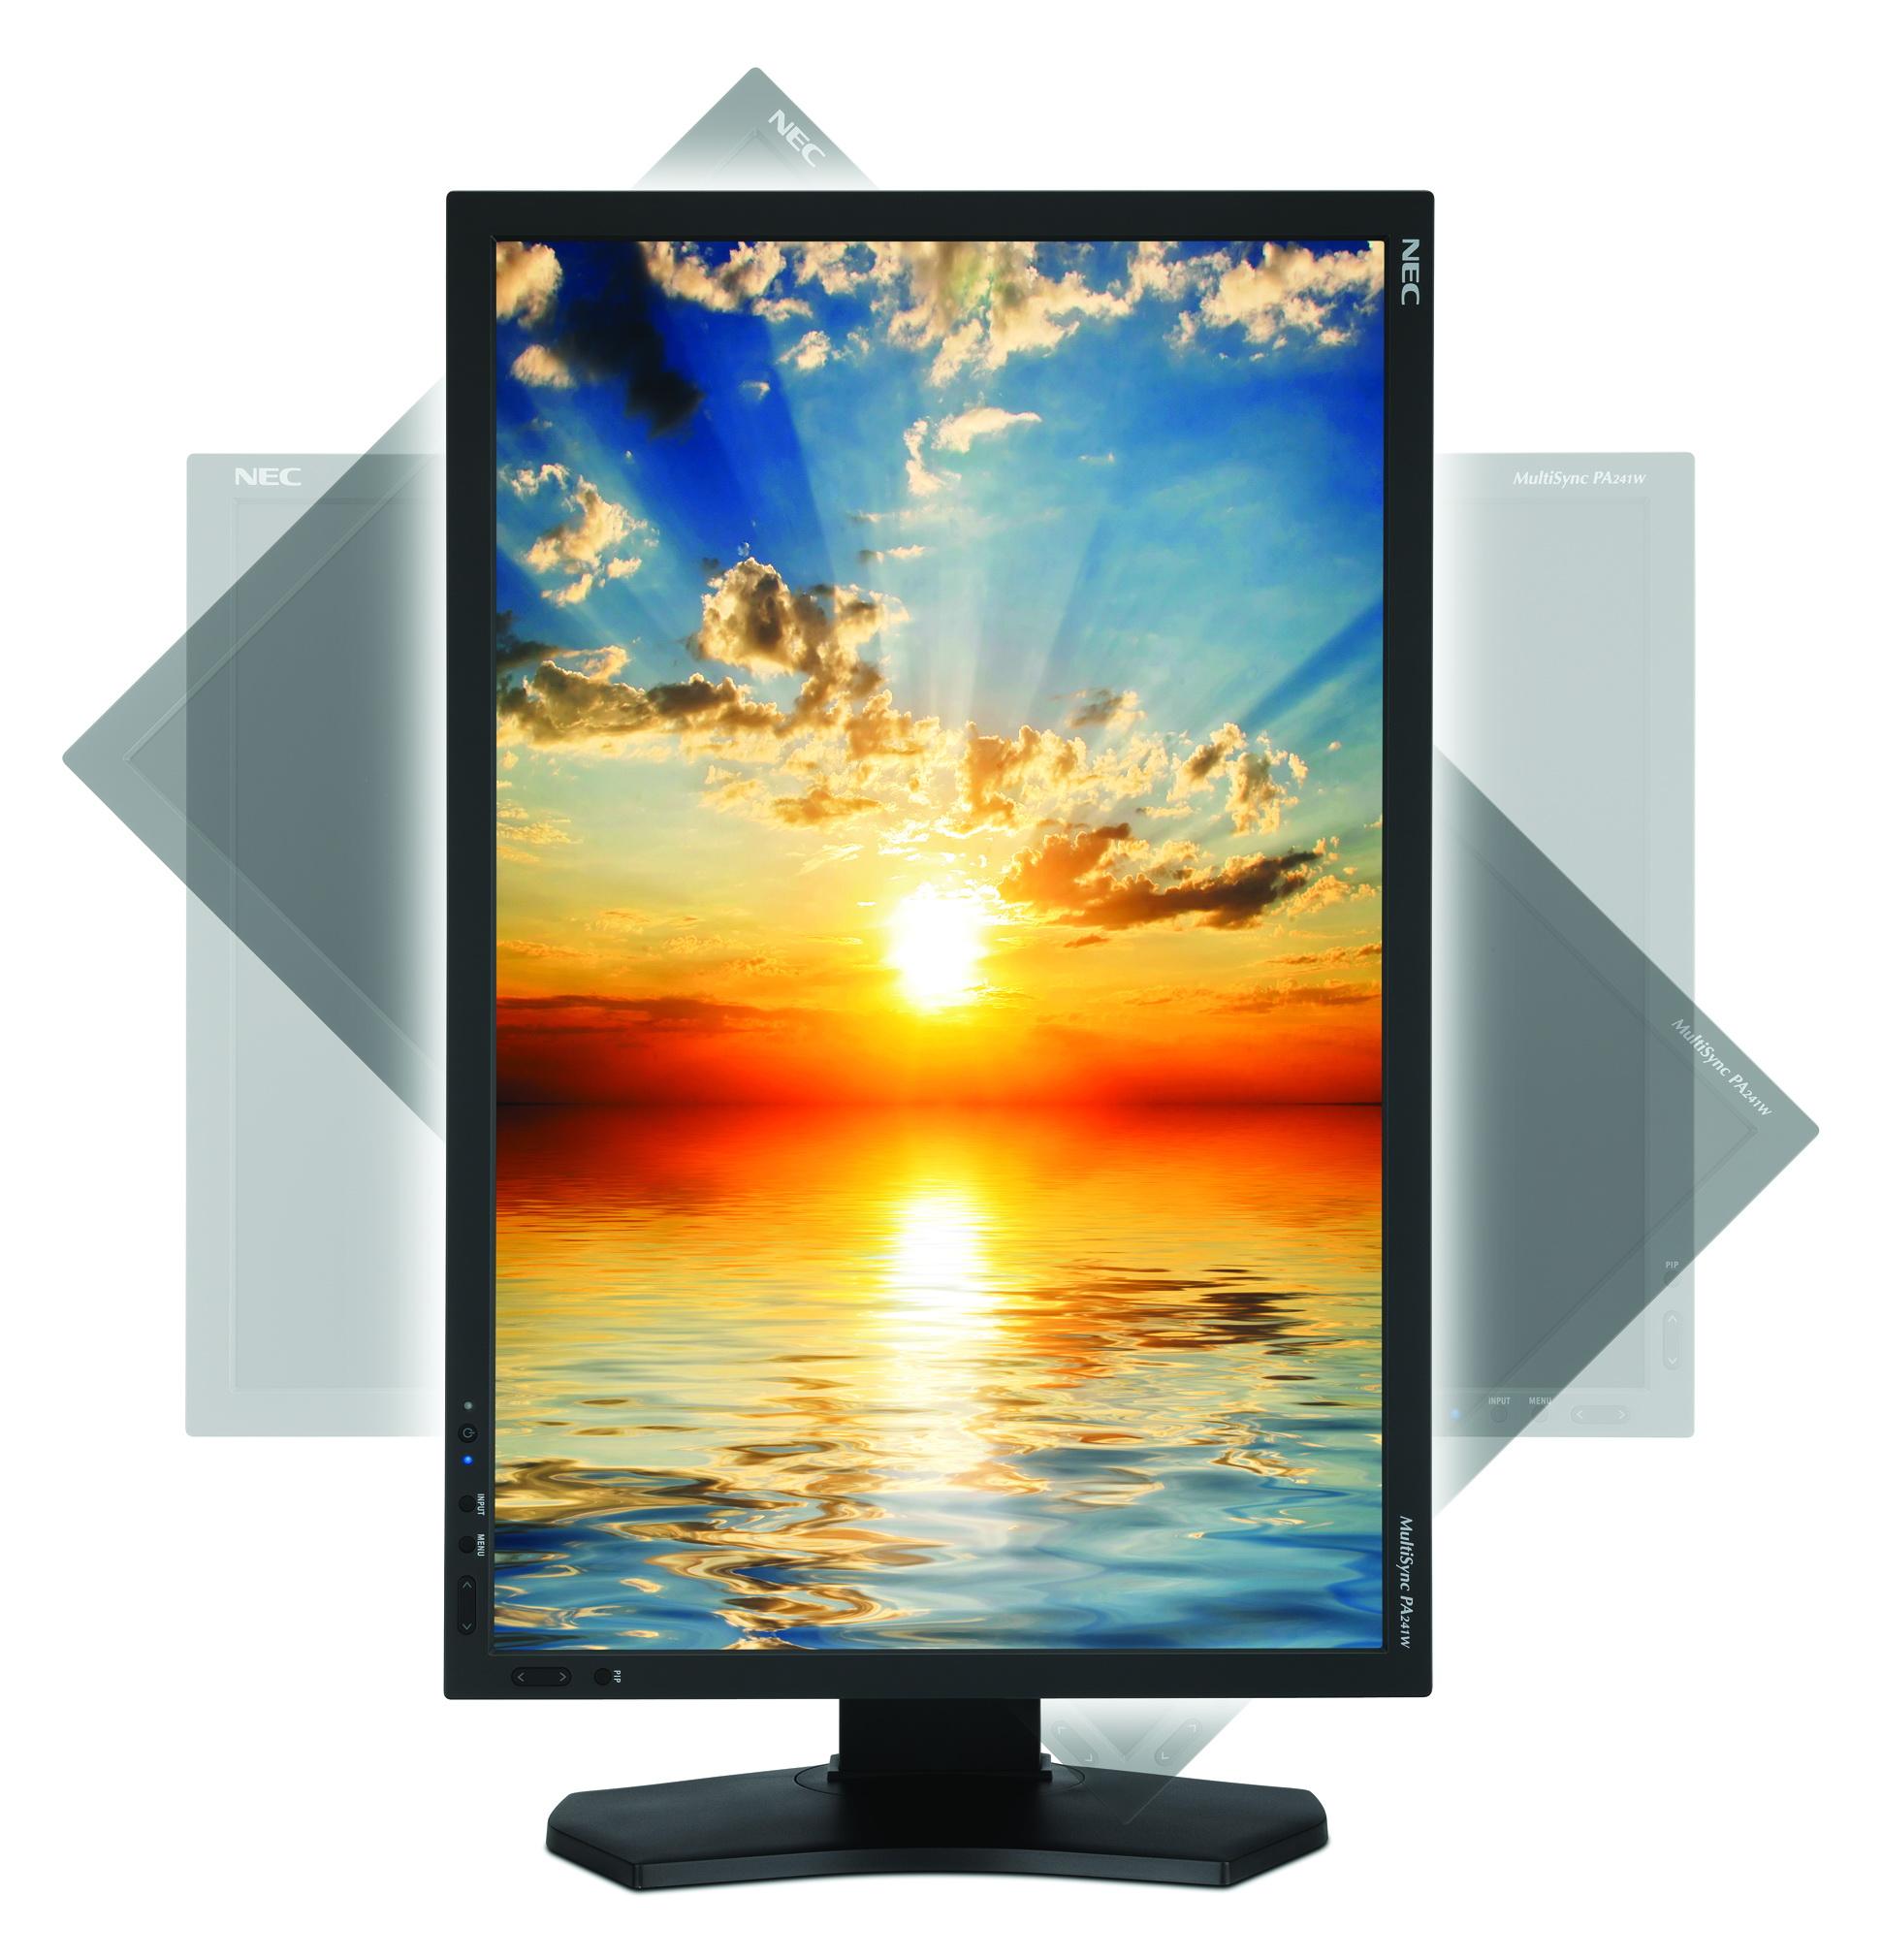 NEC intros professional MultiSync PA241W IPS LCD Monitor